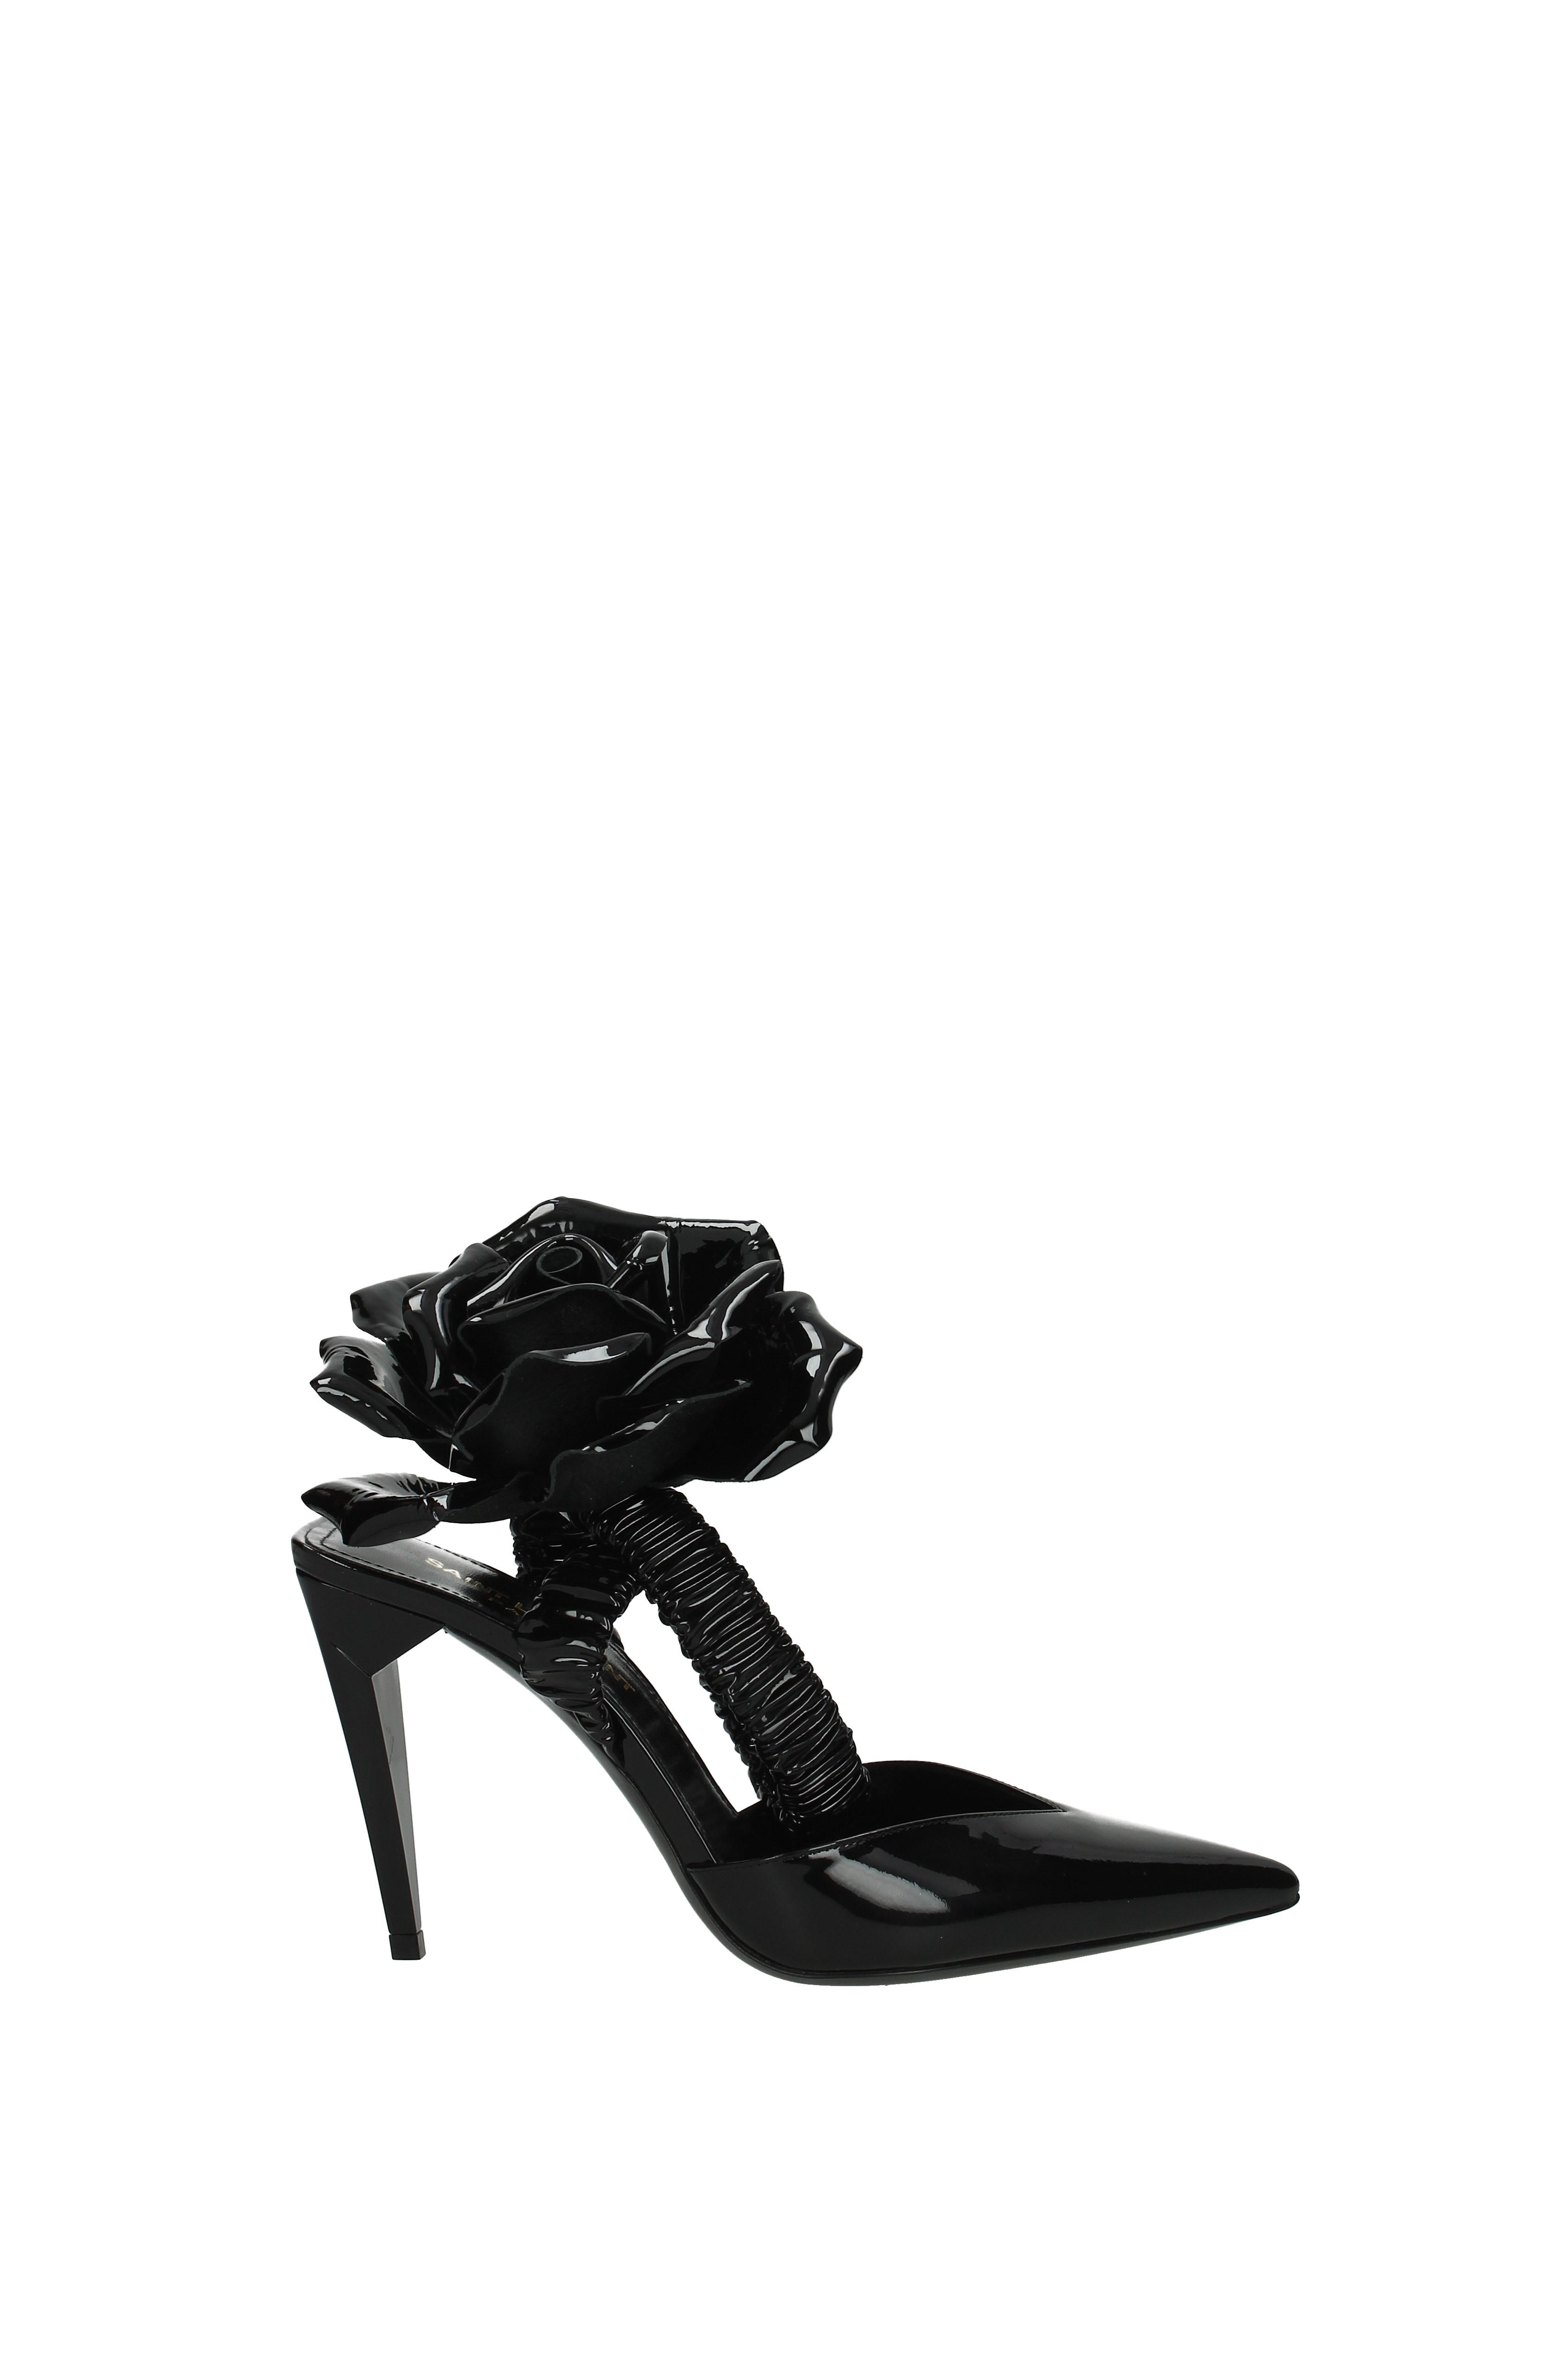 Sandali Saint Laurent freja Donna - Vernice (493870D6C00)  f436f76c4f8